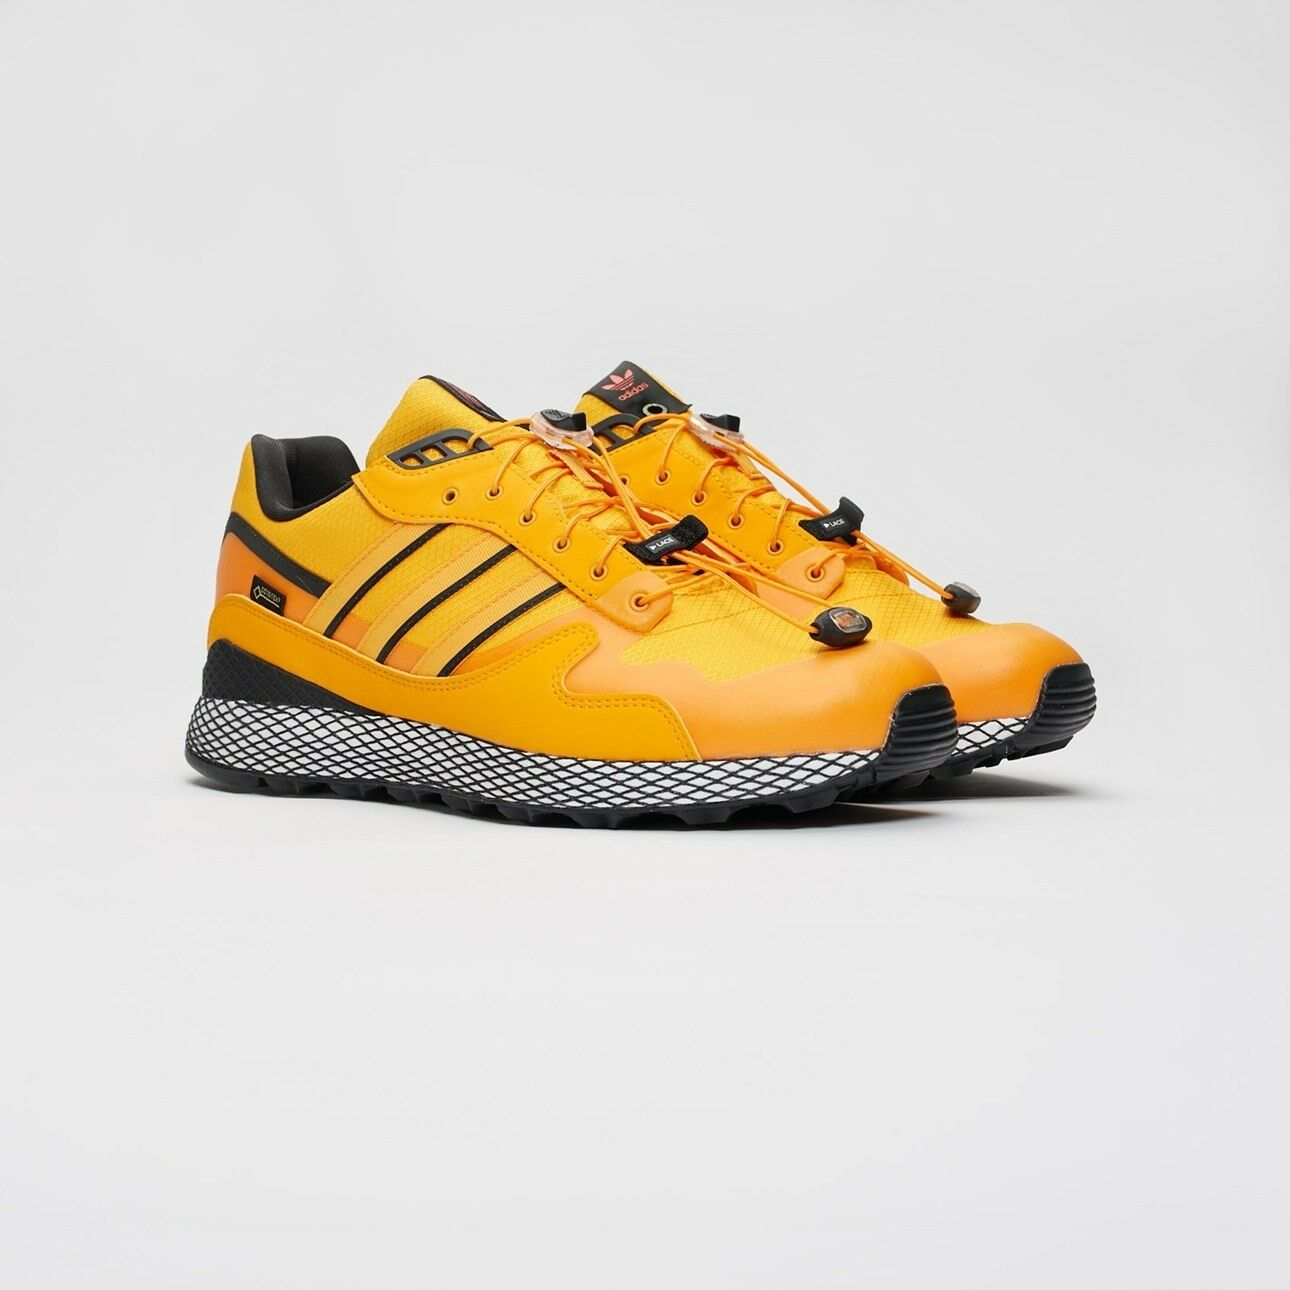 Adidas X Livestock Ultra Tech Gore-Tex Brand New in Box-UK 9.5 /US 10.5 UE 44.5